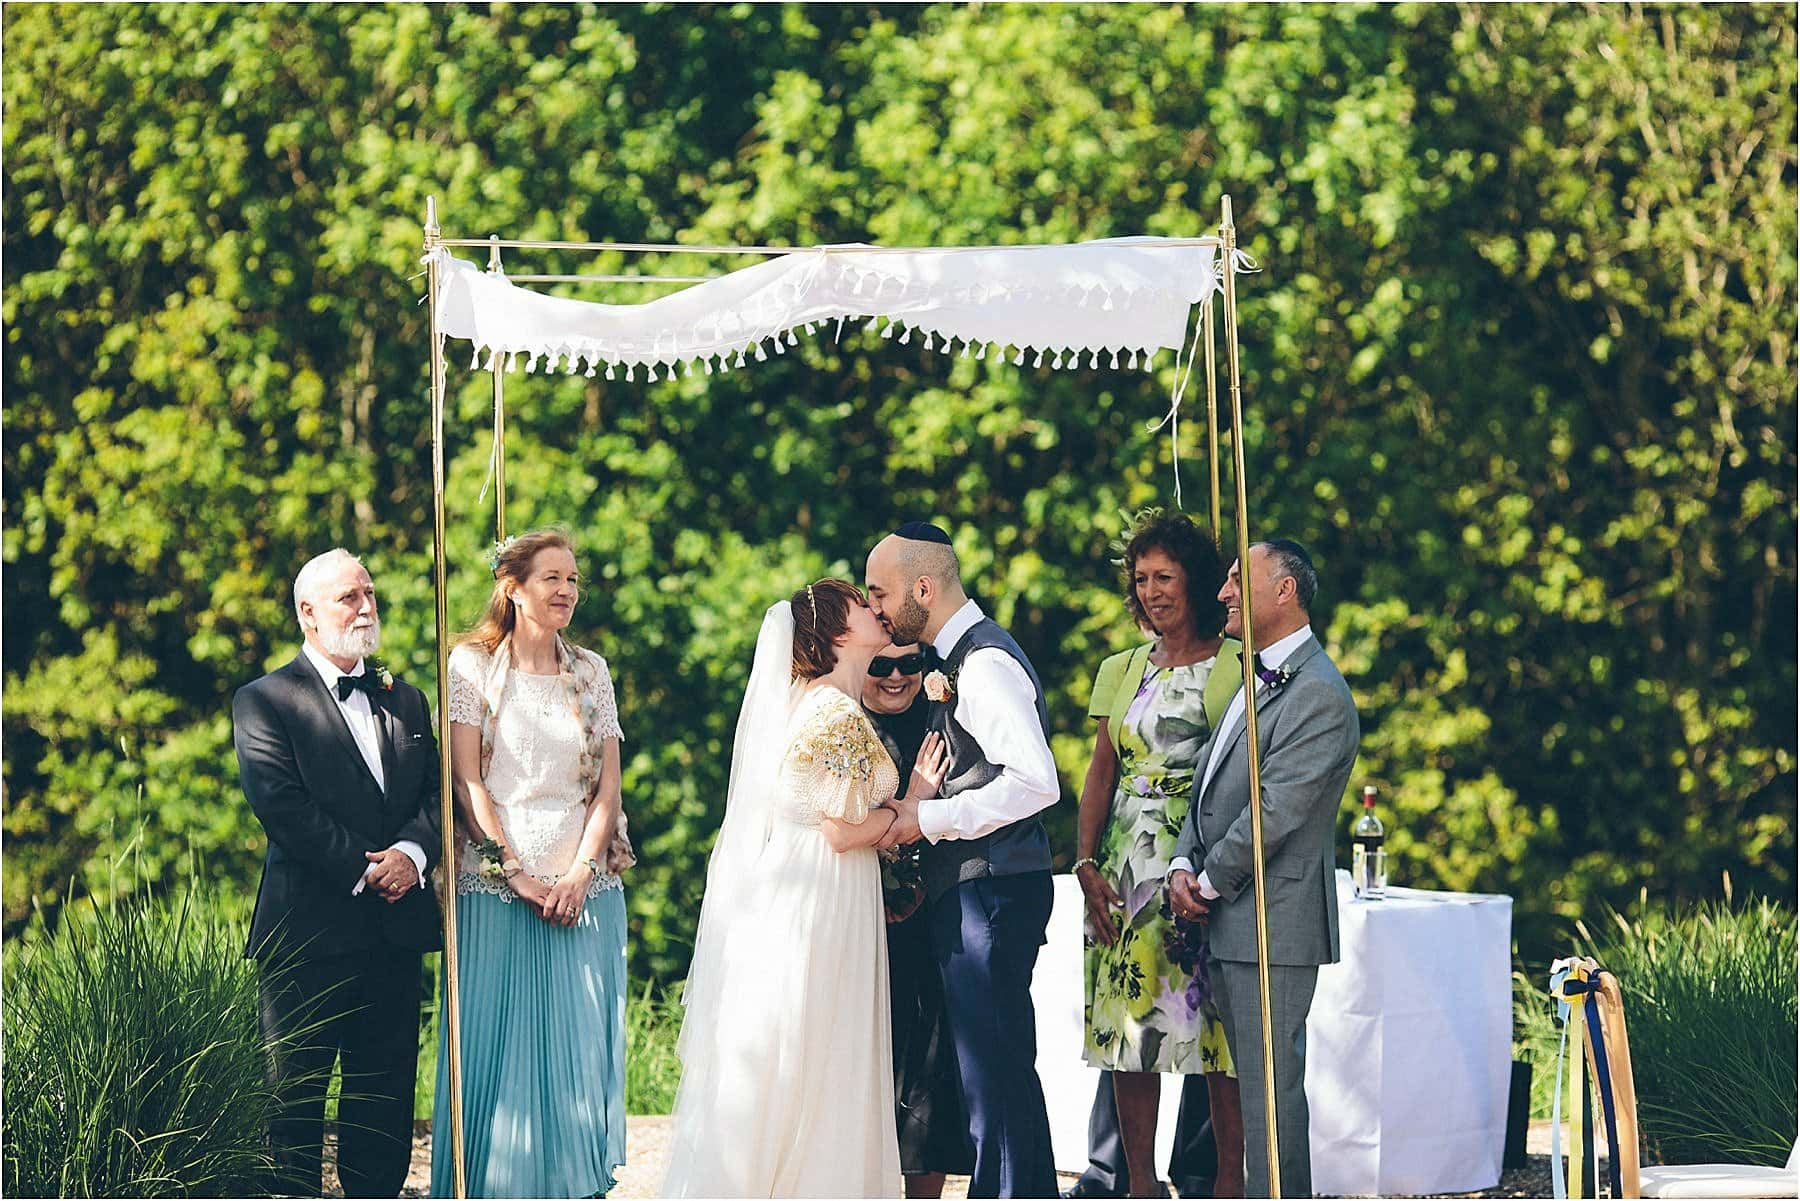 The_Barn_At_Bury_Court_Wedding_049